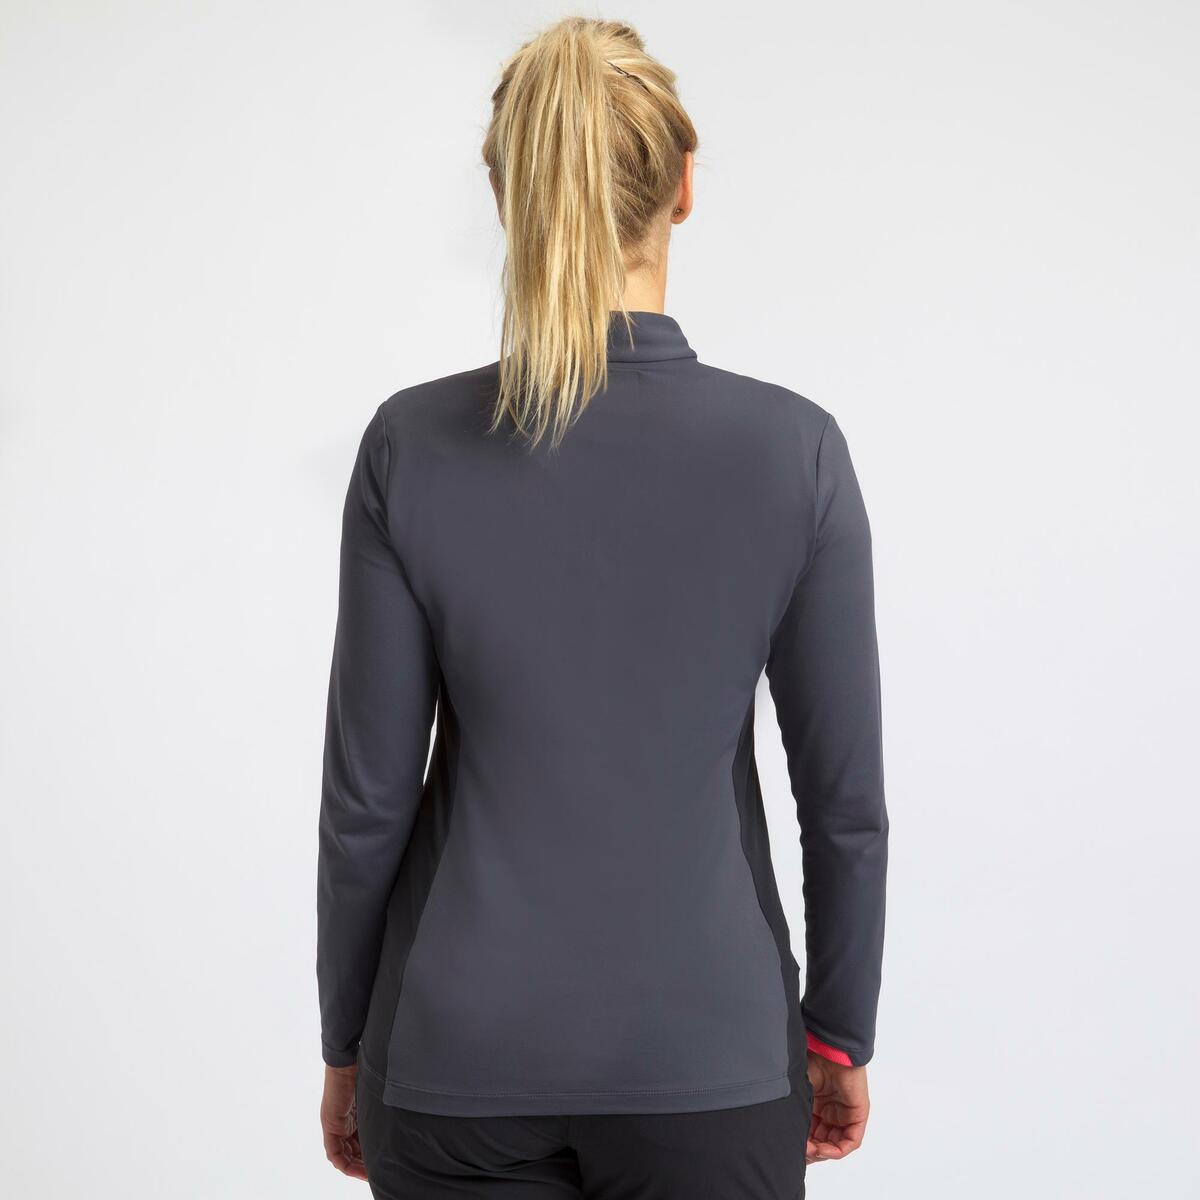 Bild 4 von Segelshirt langarm Race Damen dunkelgrau